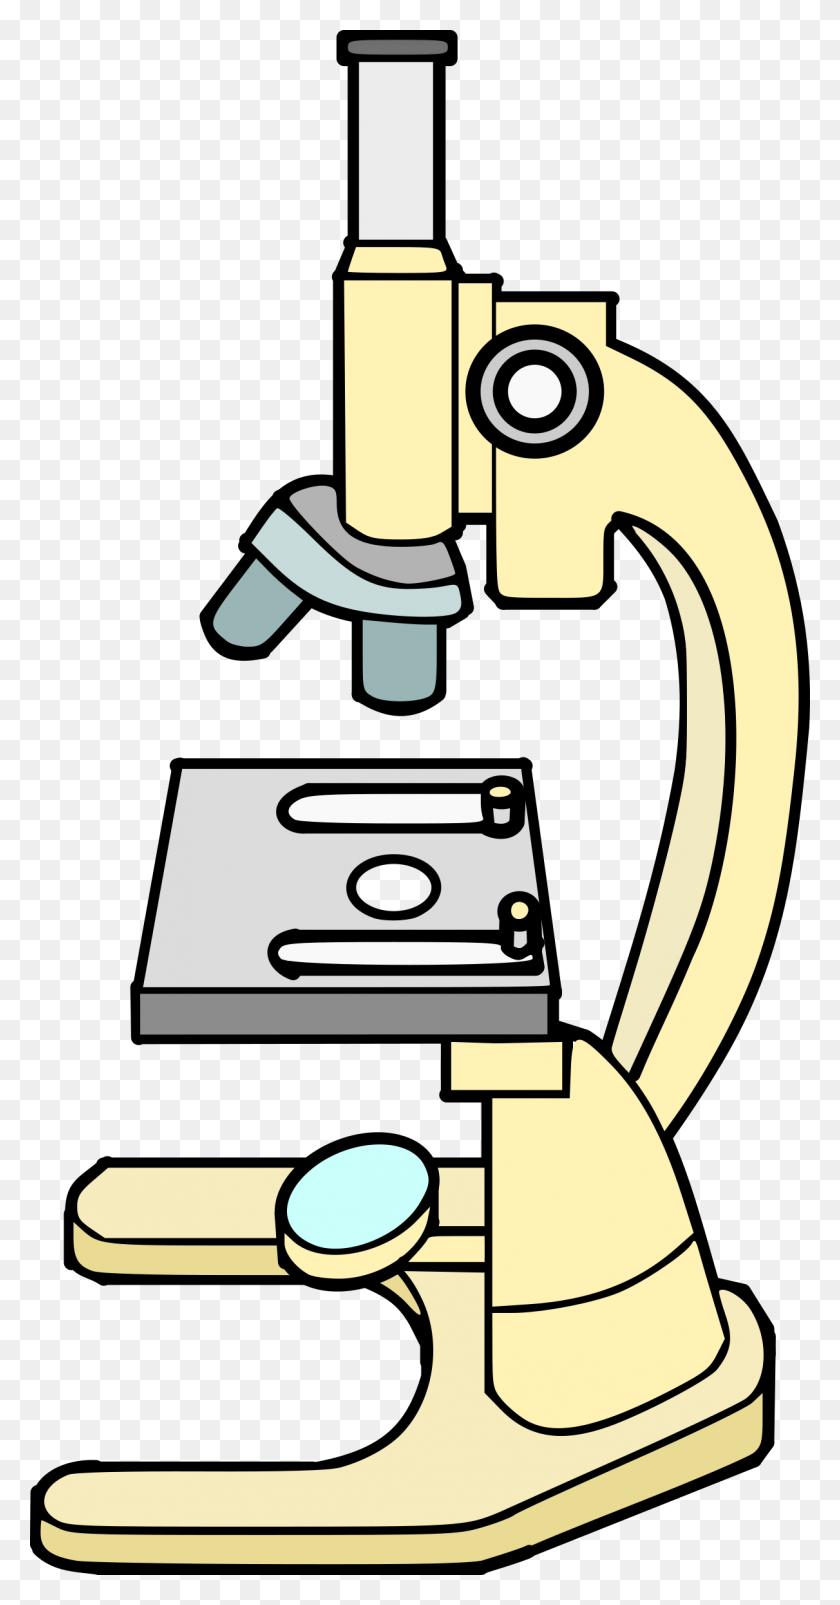 Scientist Clipart Microscope, Scientist Microscope Transparent - Scientist Clipart PNG